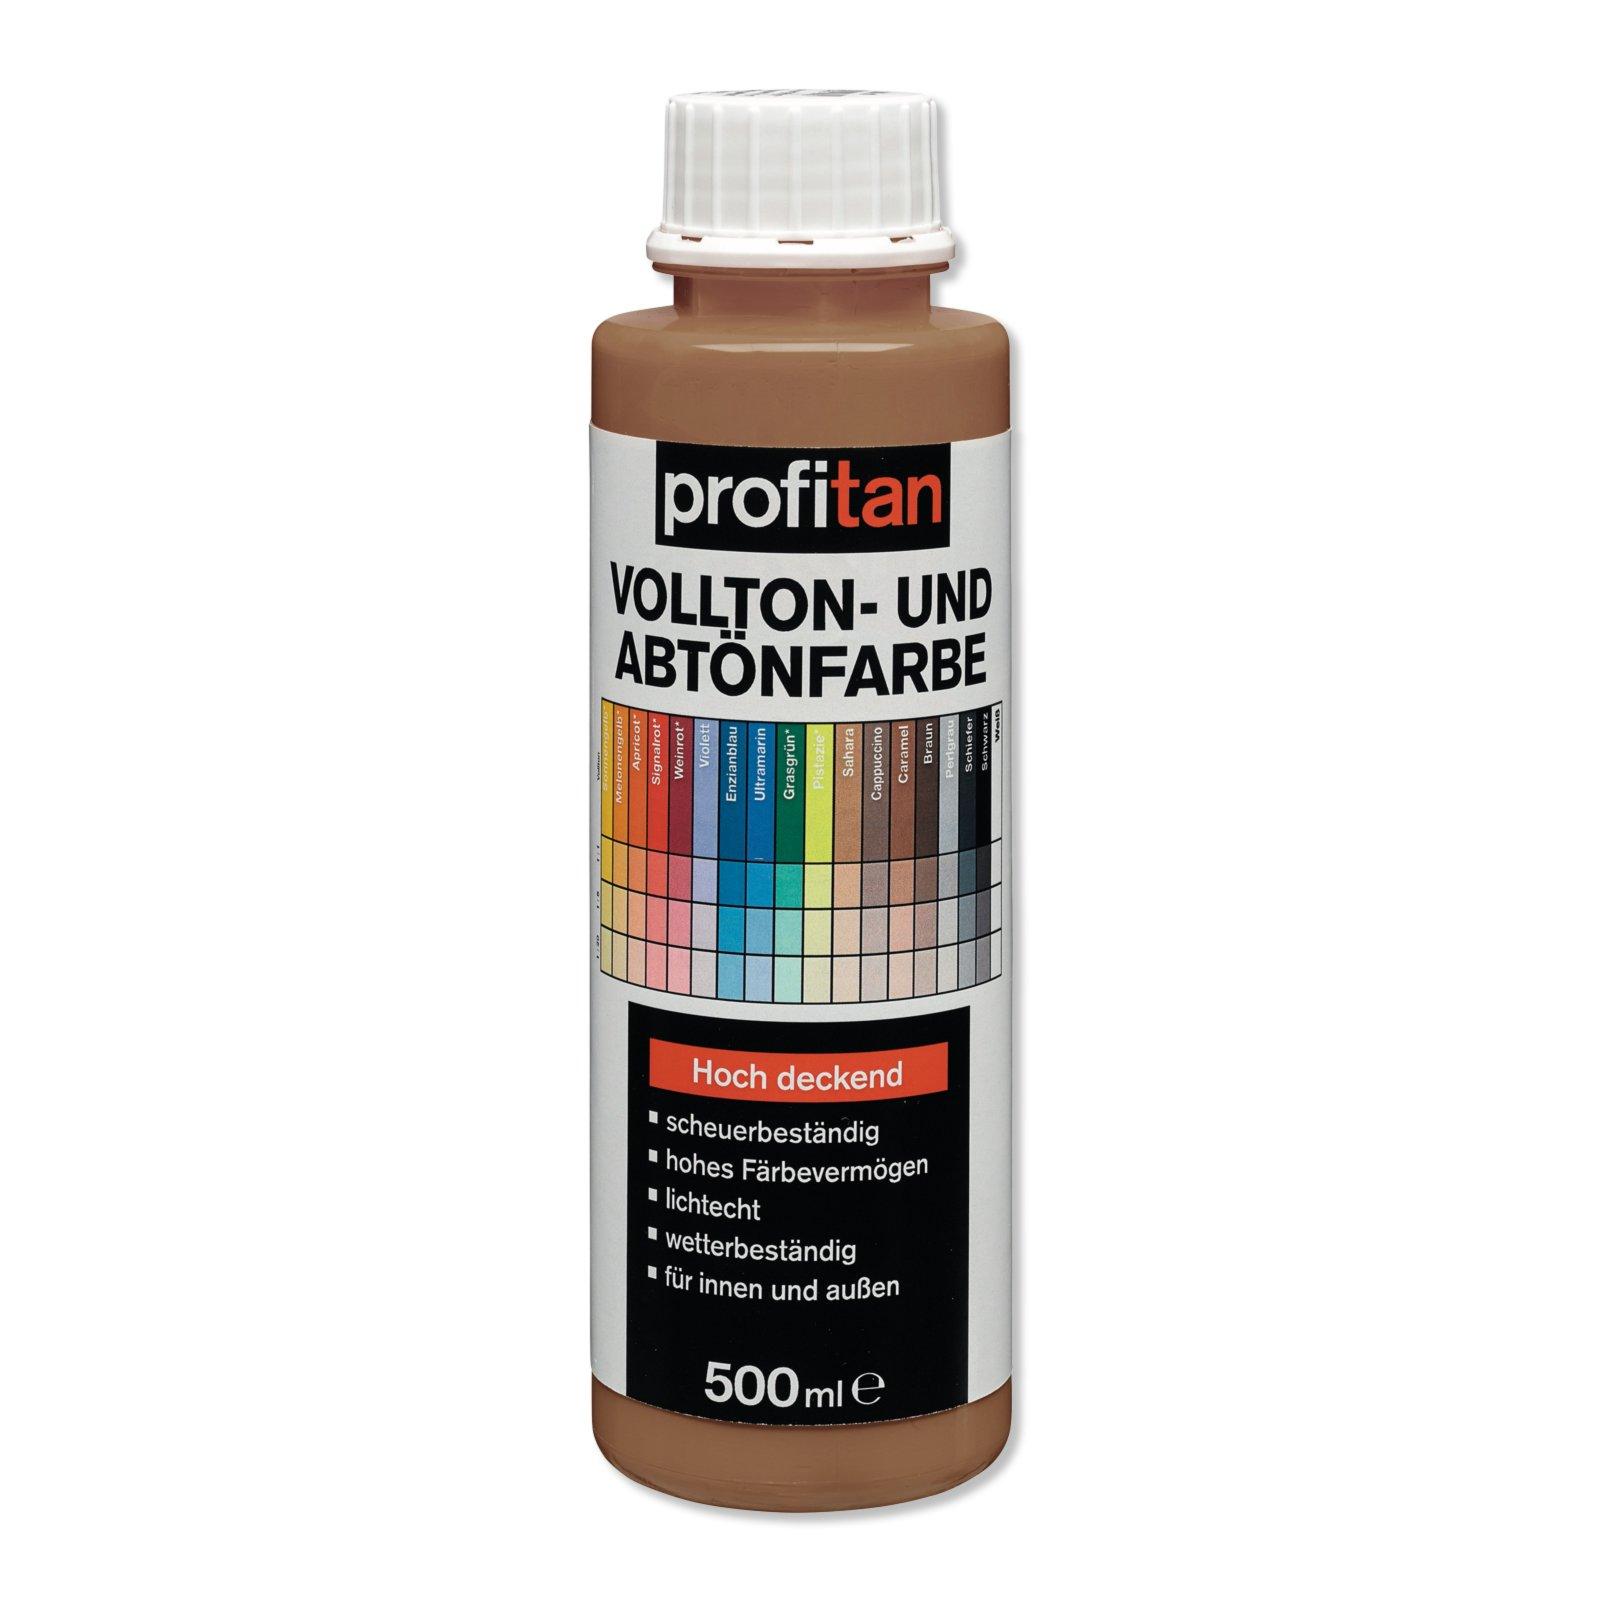 Vollton- und Abtönfarbe profitan - caramel - 500 ml